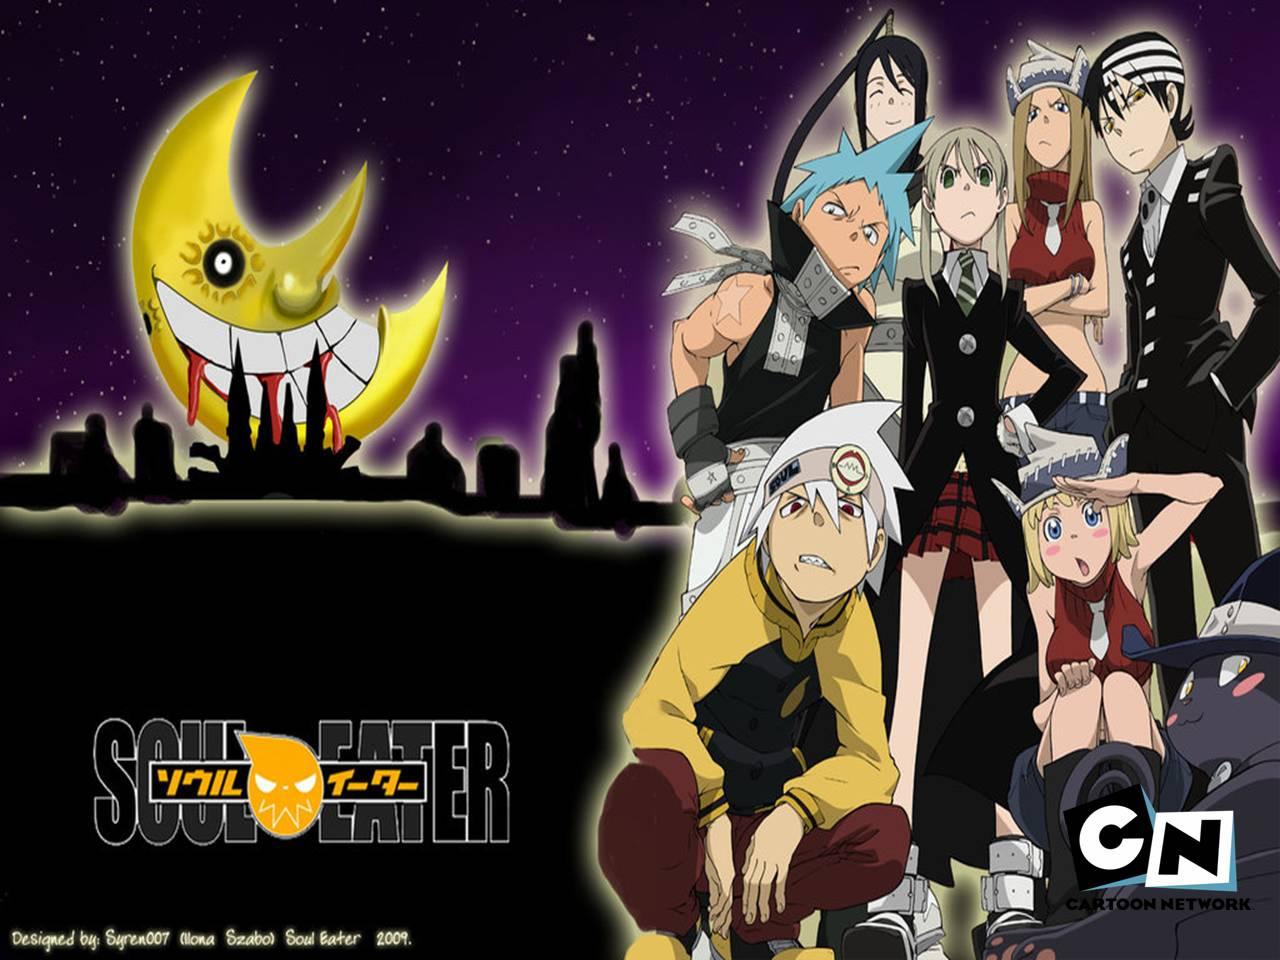 Soul Eater Cartoon Network